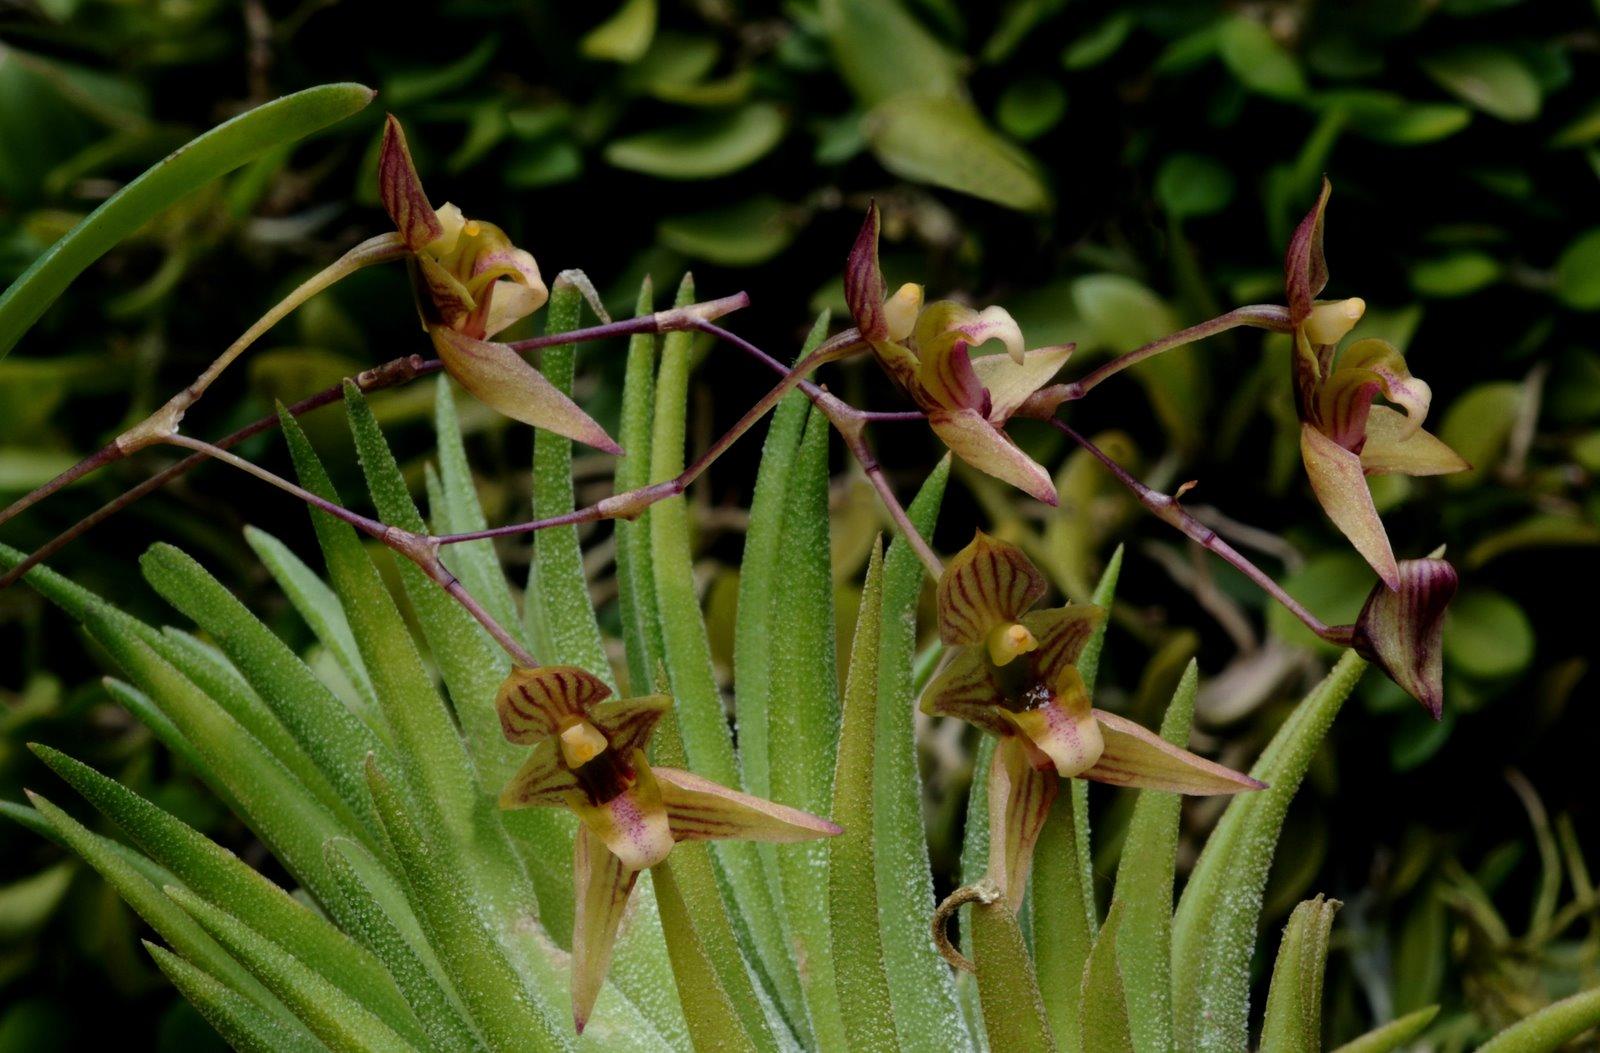 http://www.orchidspecies.com/orphotdir/bulbocymbidioides.jpg